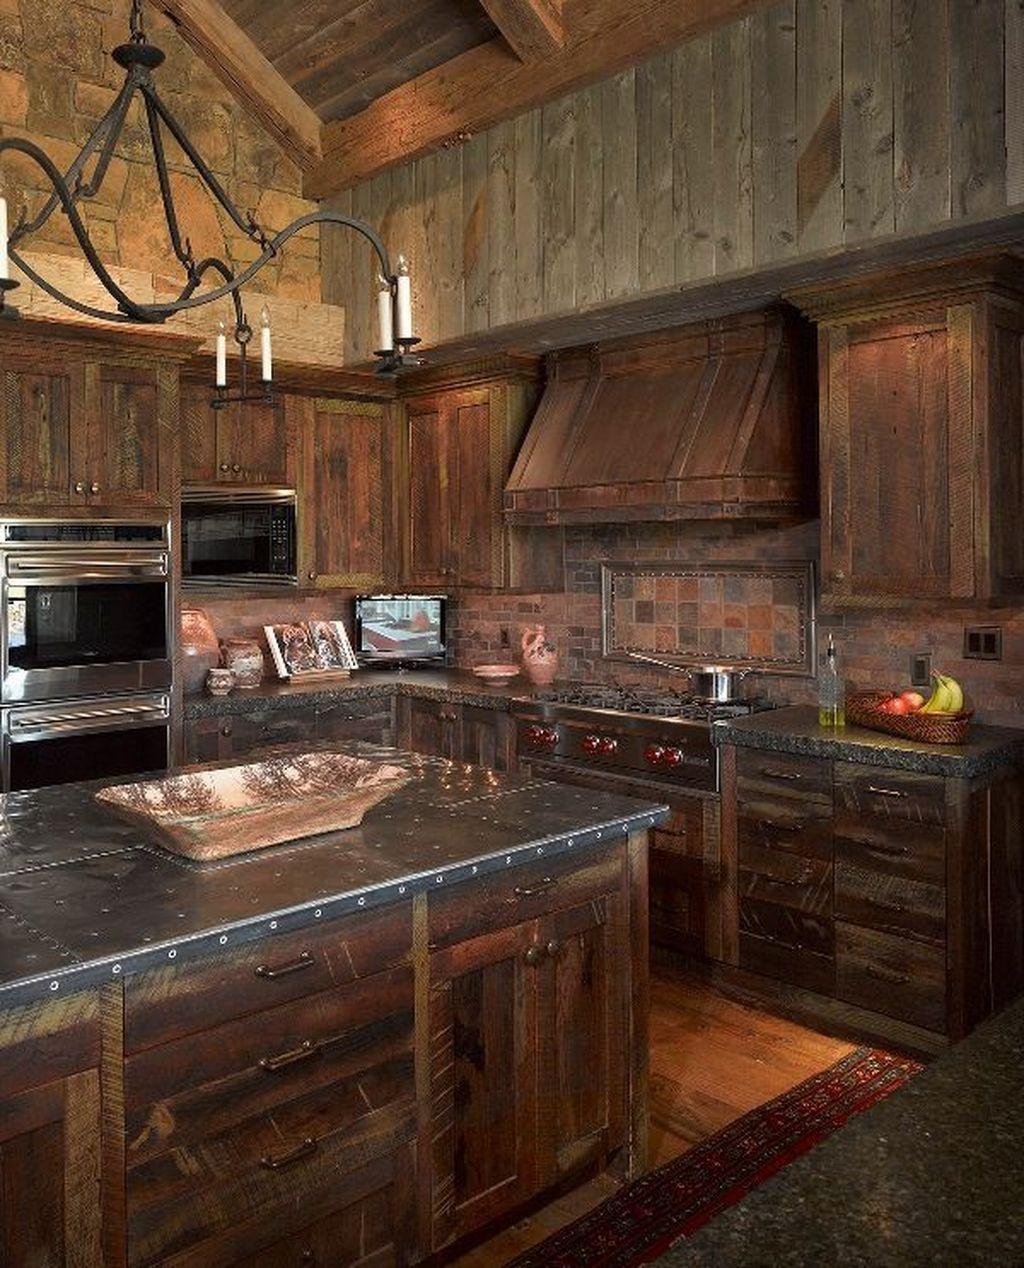 90 Beautiful Farmhouse Style Rustic Kitchen Cabinet Decoration Ideas Rustic Kitchen Backsplash Rustic Home Design Western Kitchen